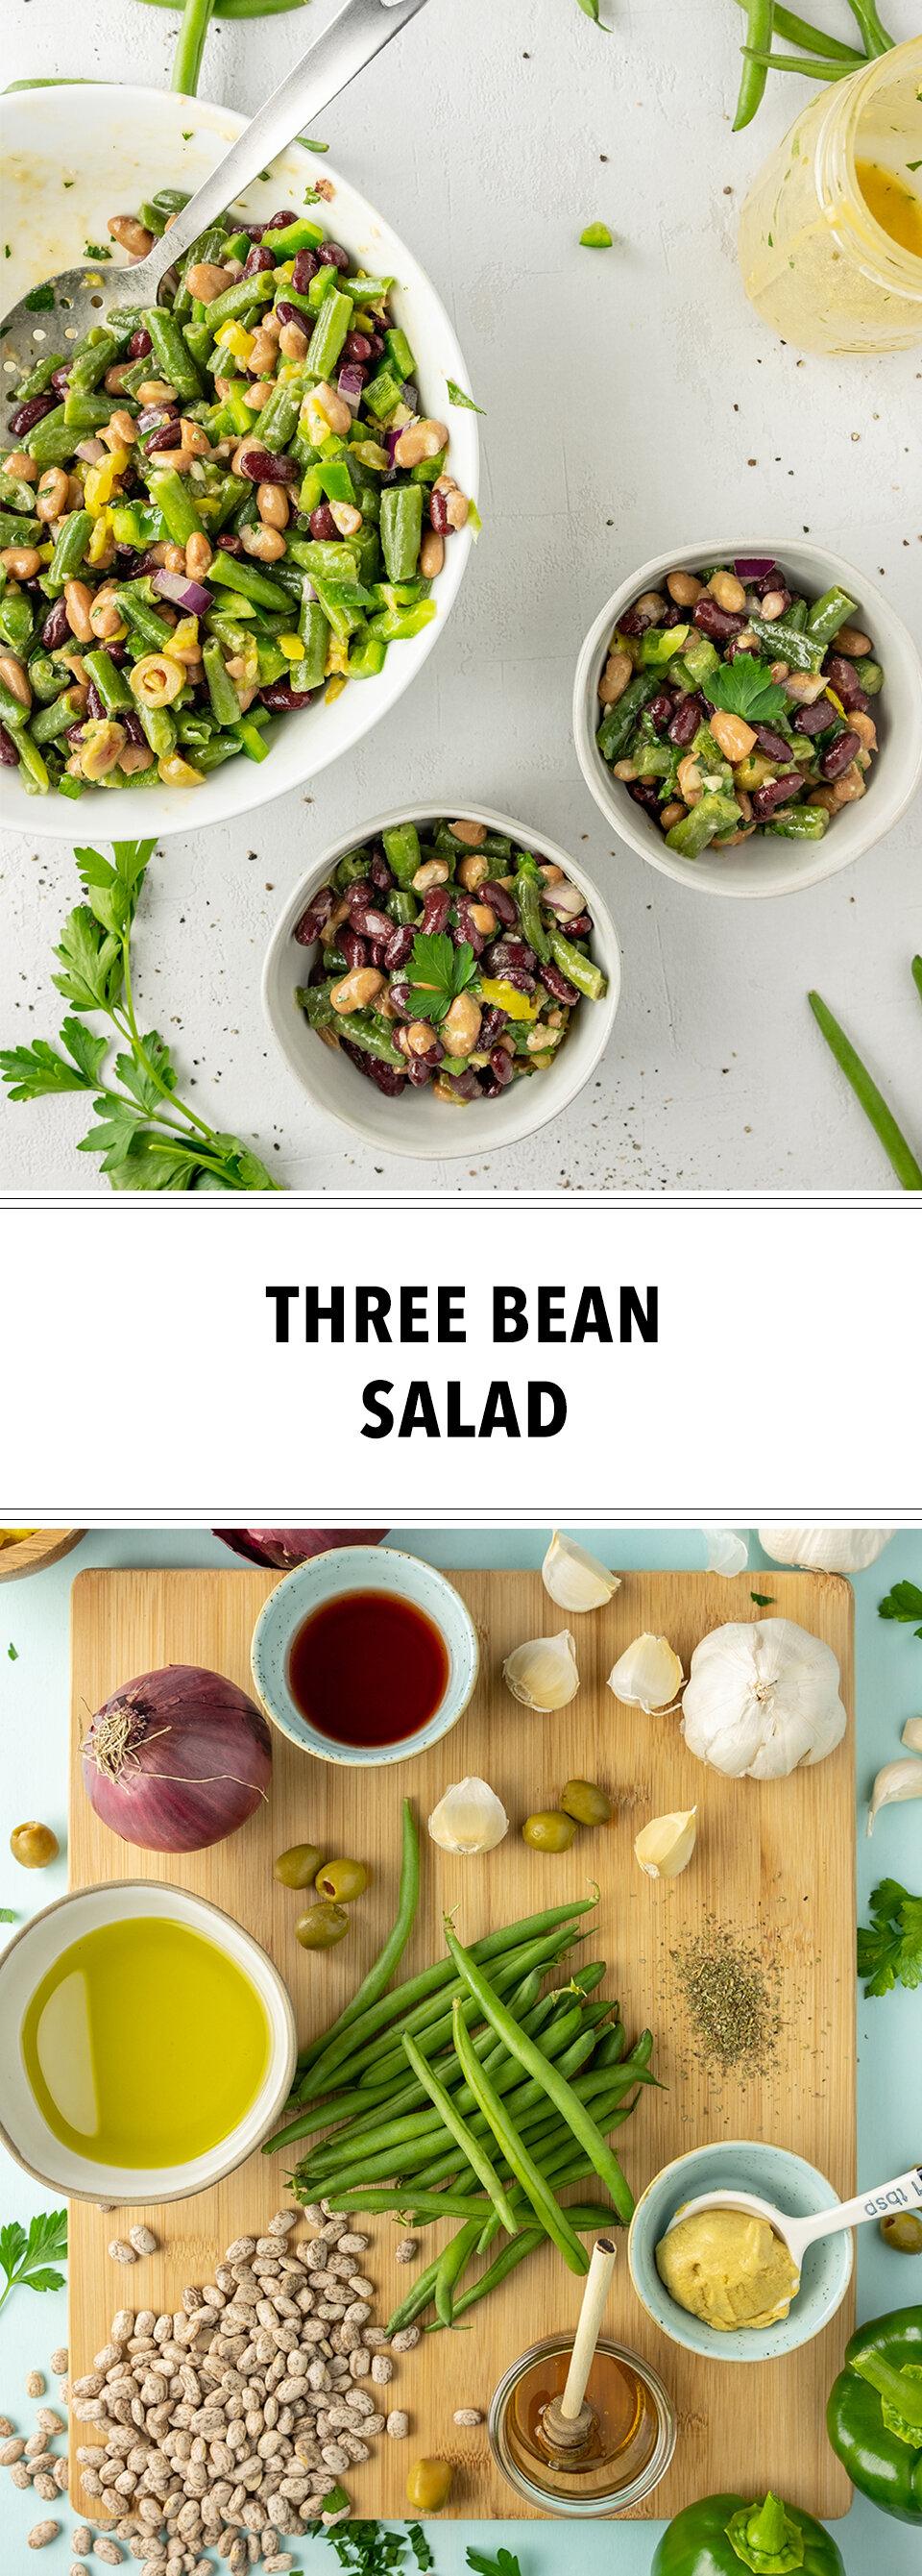 JodiLoves_Retouching_Brilliant_Pixel_Imaging-Three-Bean-Salad.jpg